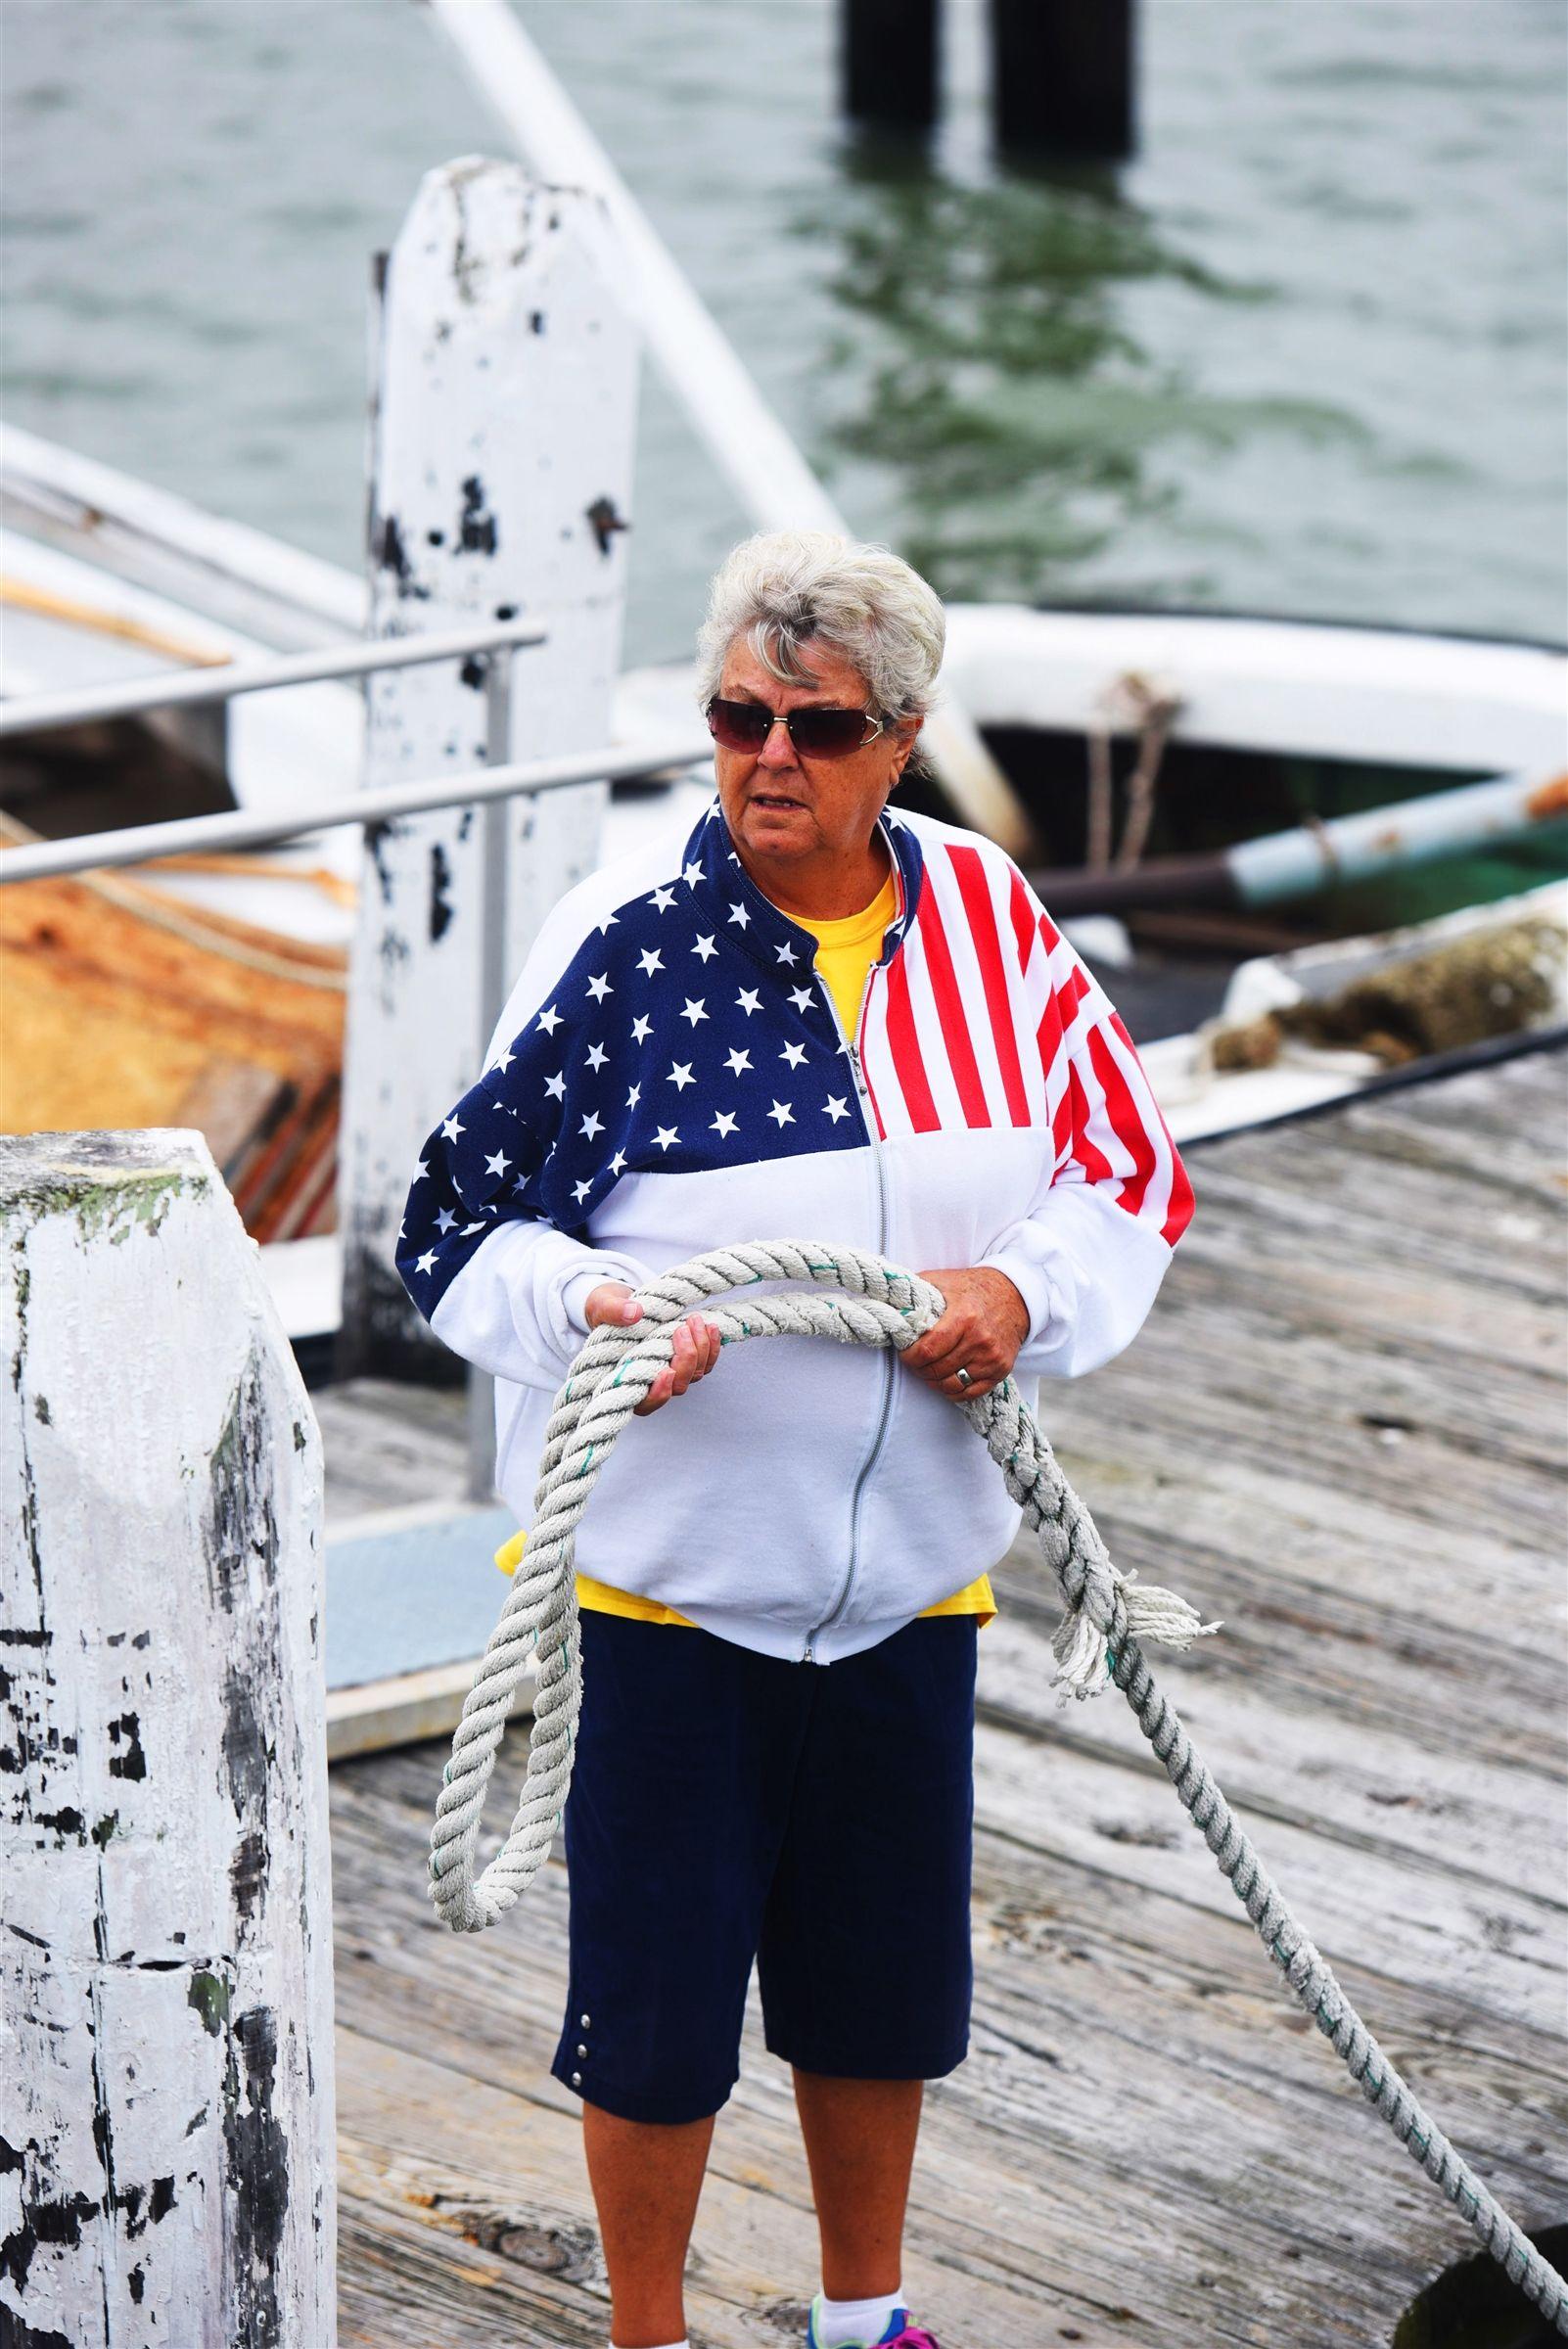 Christchurch School Photo Gallery Andrew Smith Bermuda Shorts Navy 33 11th Grade Immersion Trip 2016